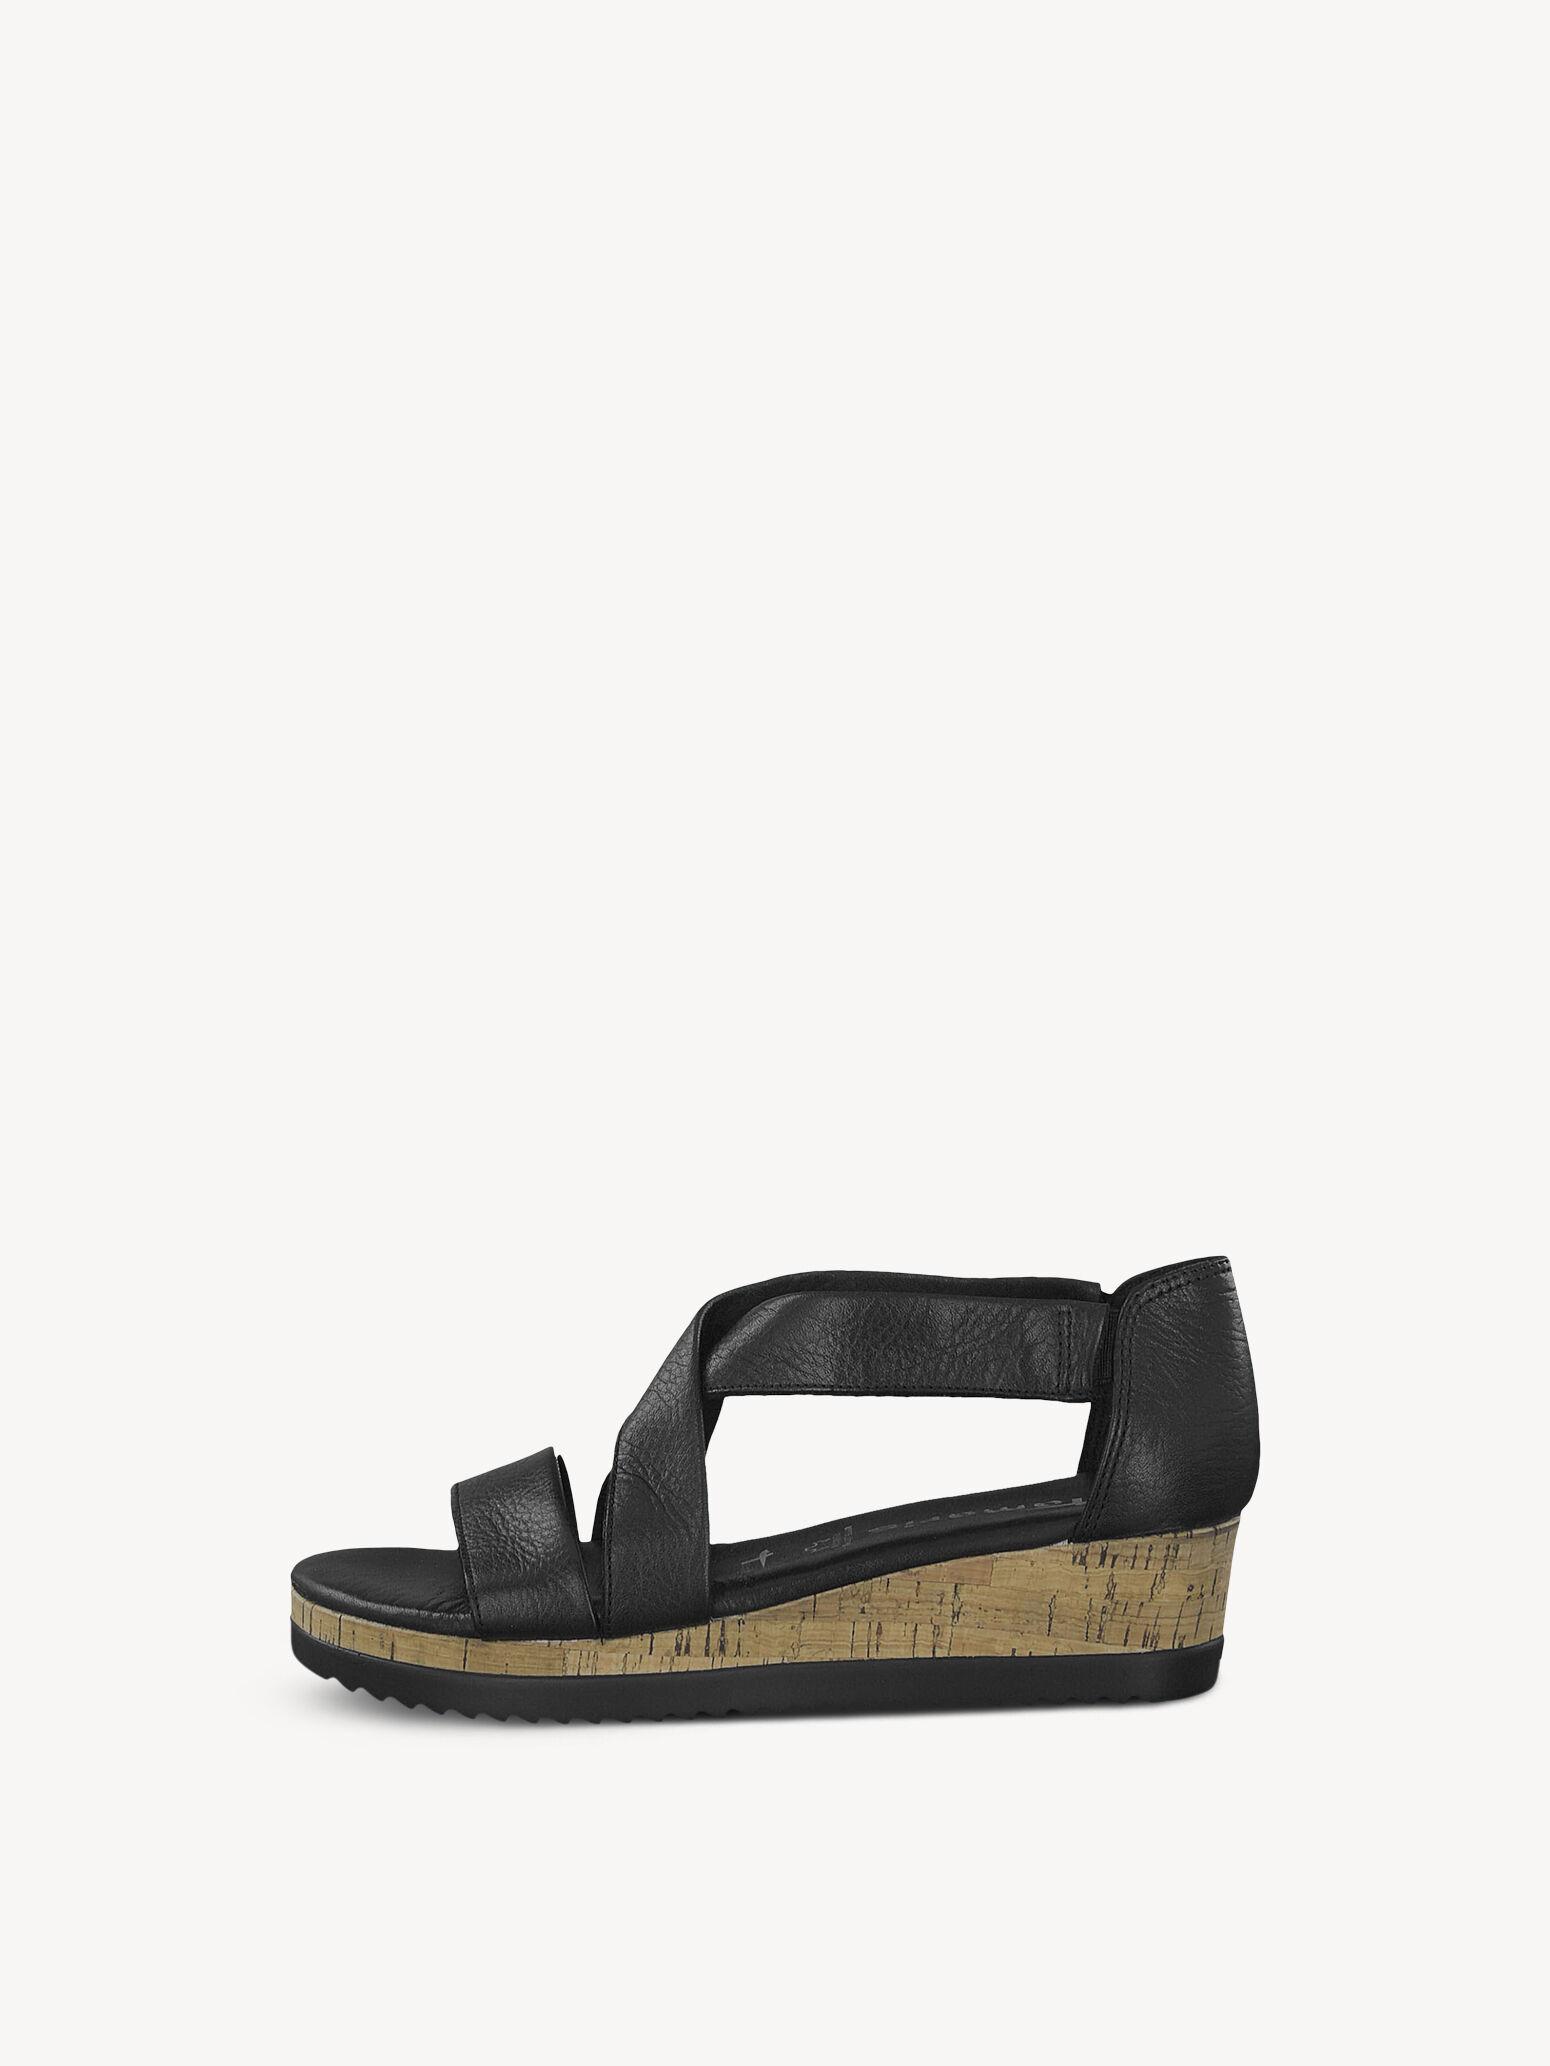 Tamaris À Talons Sandales Chaussures Femmes rCoxedB